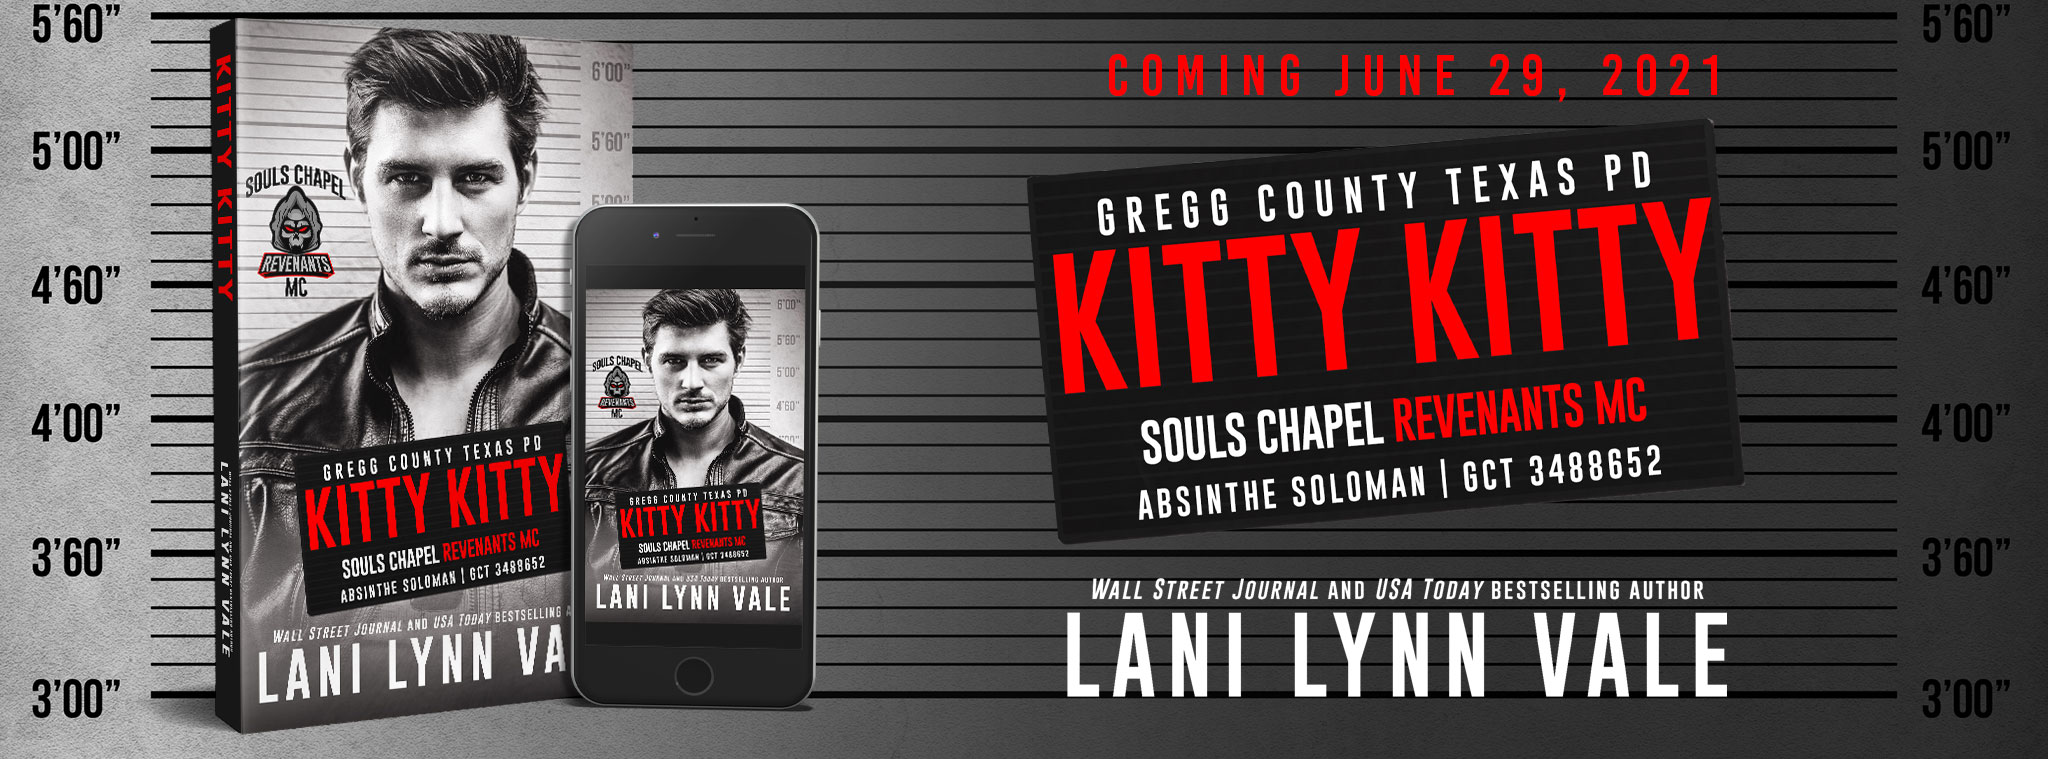 Kitty Kitty by Lani Lynn Vale